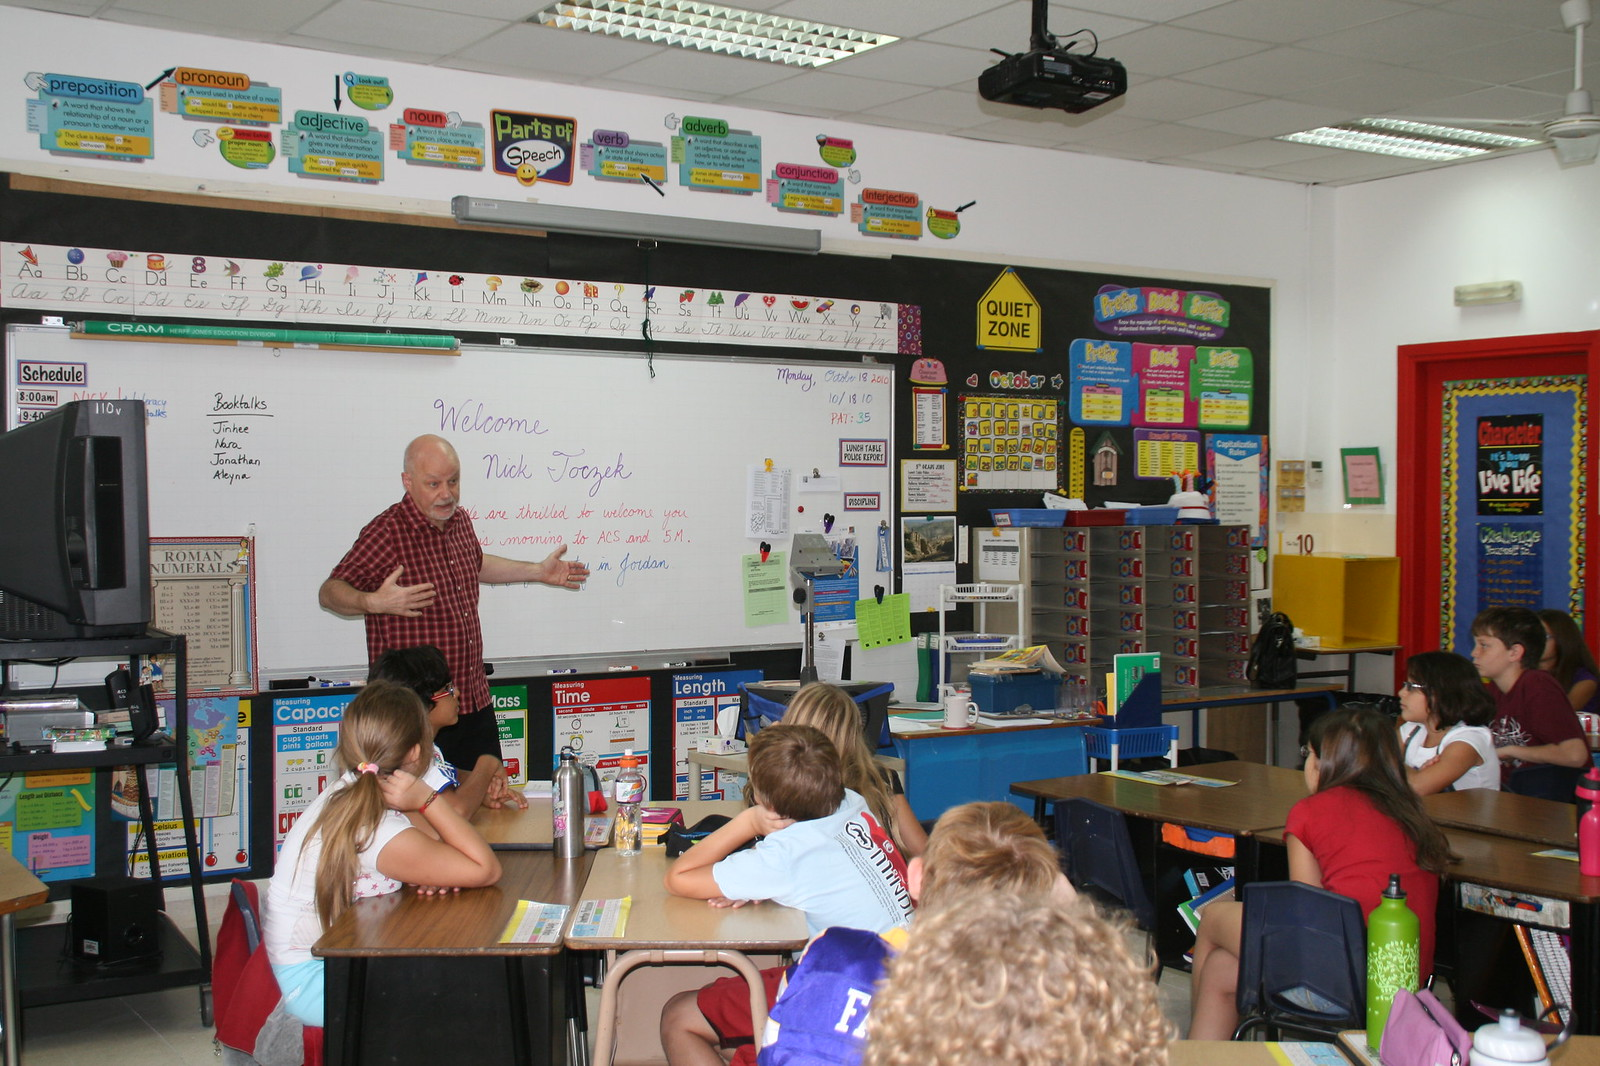 Teacher in front of K-12 class